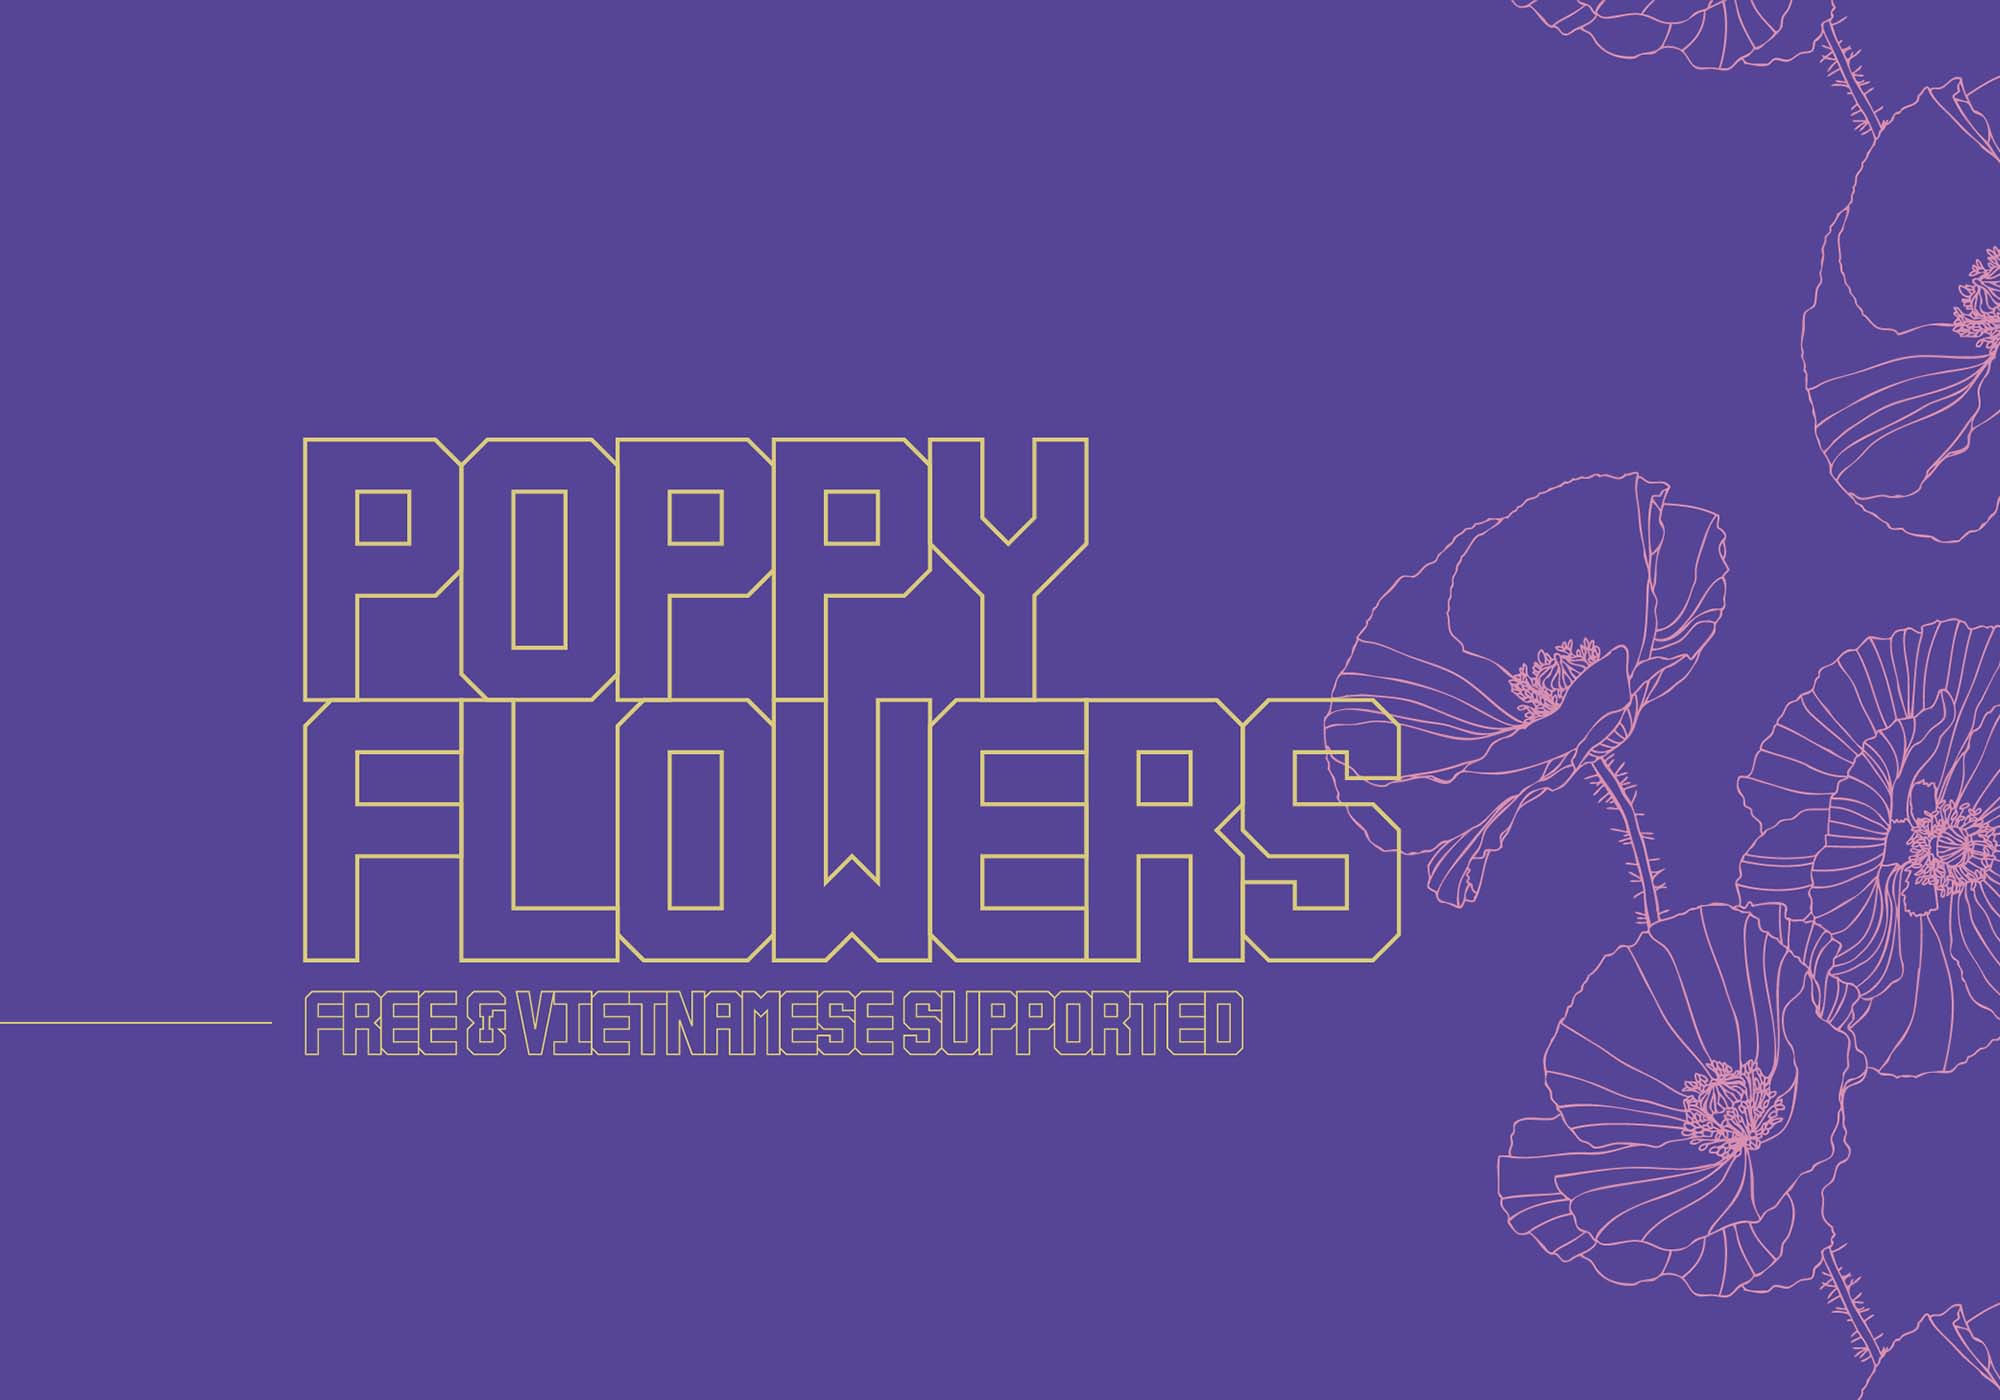 Poppy Flowers Typeface